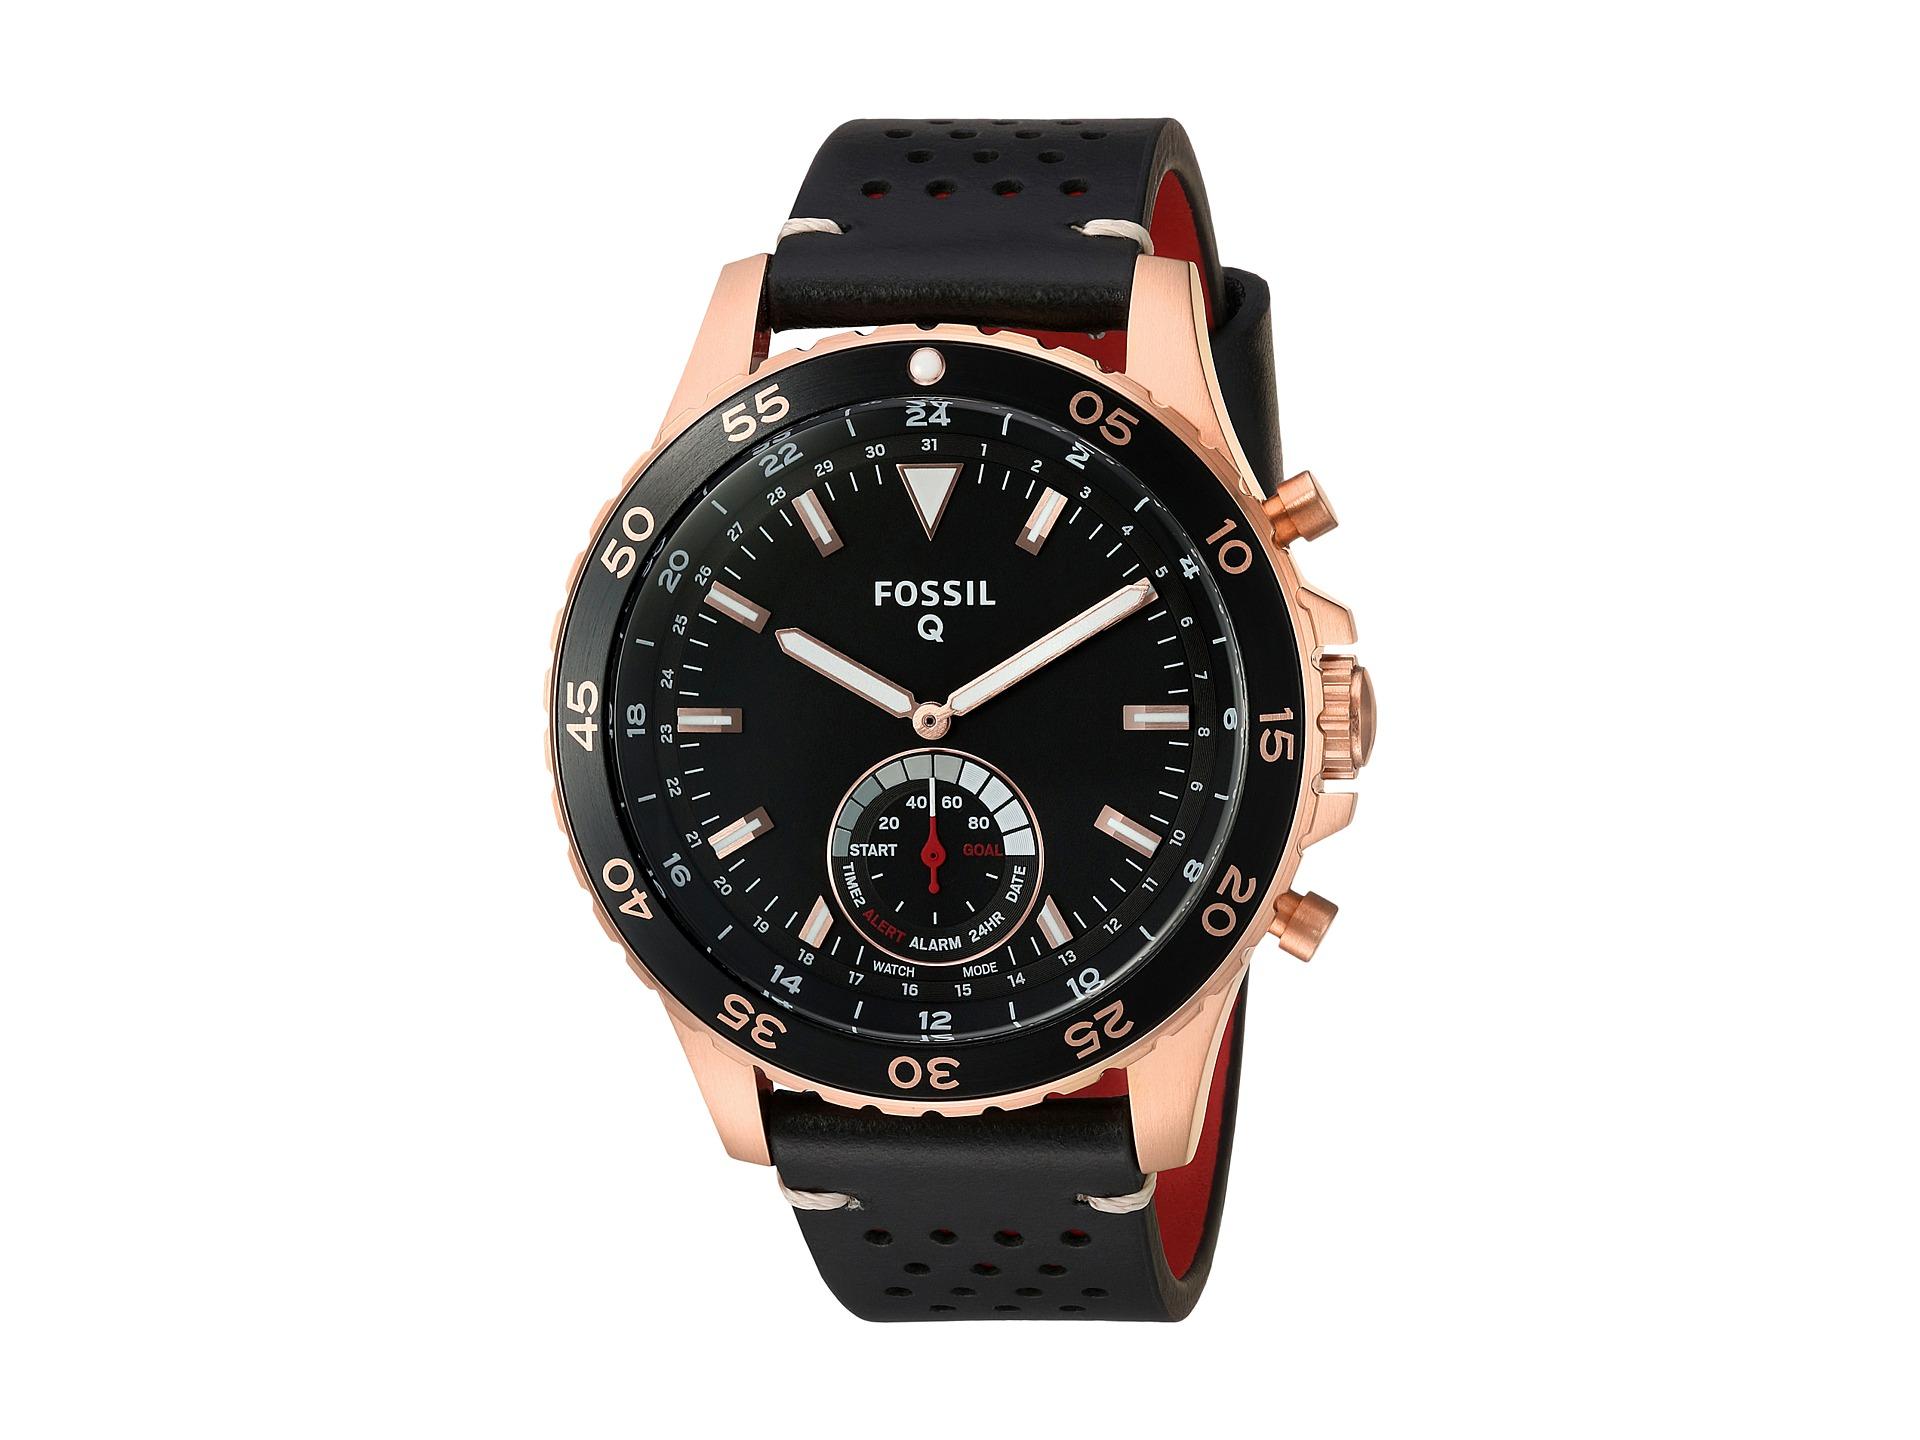 Fossil Q Q Crewmaster Hybrid Smartwatch - FTW1141